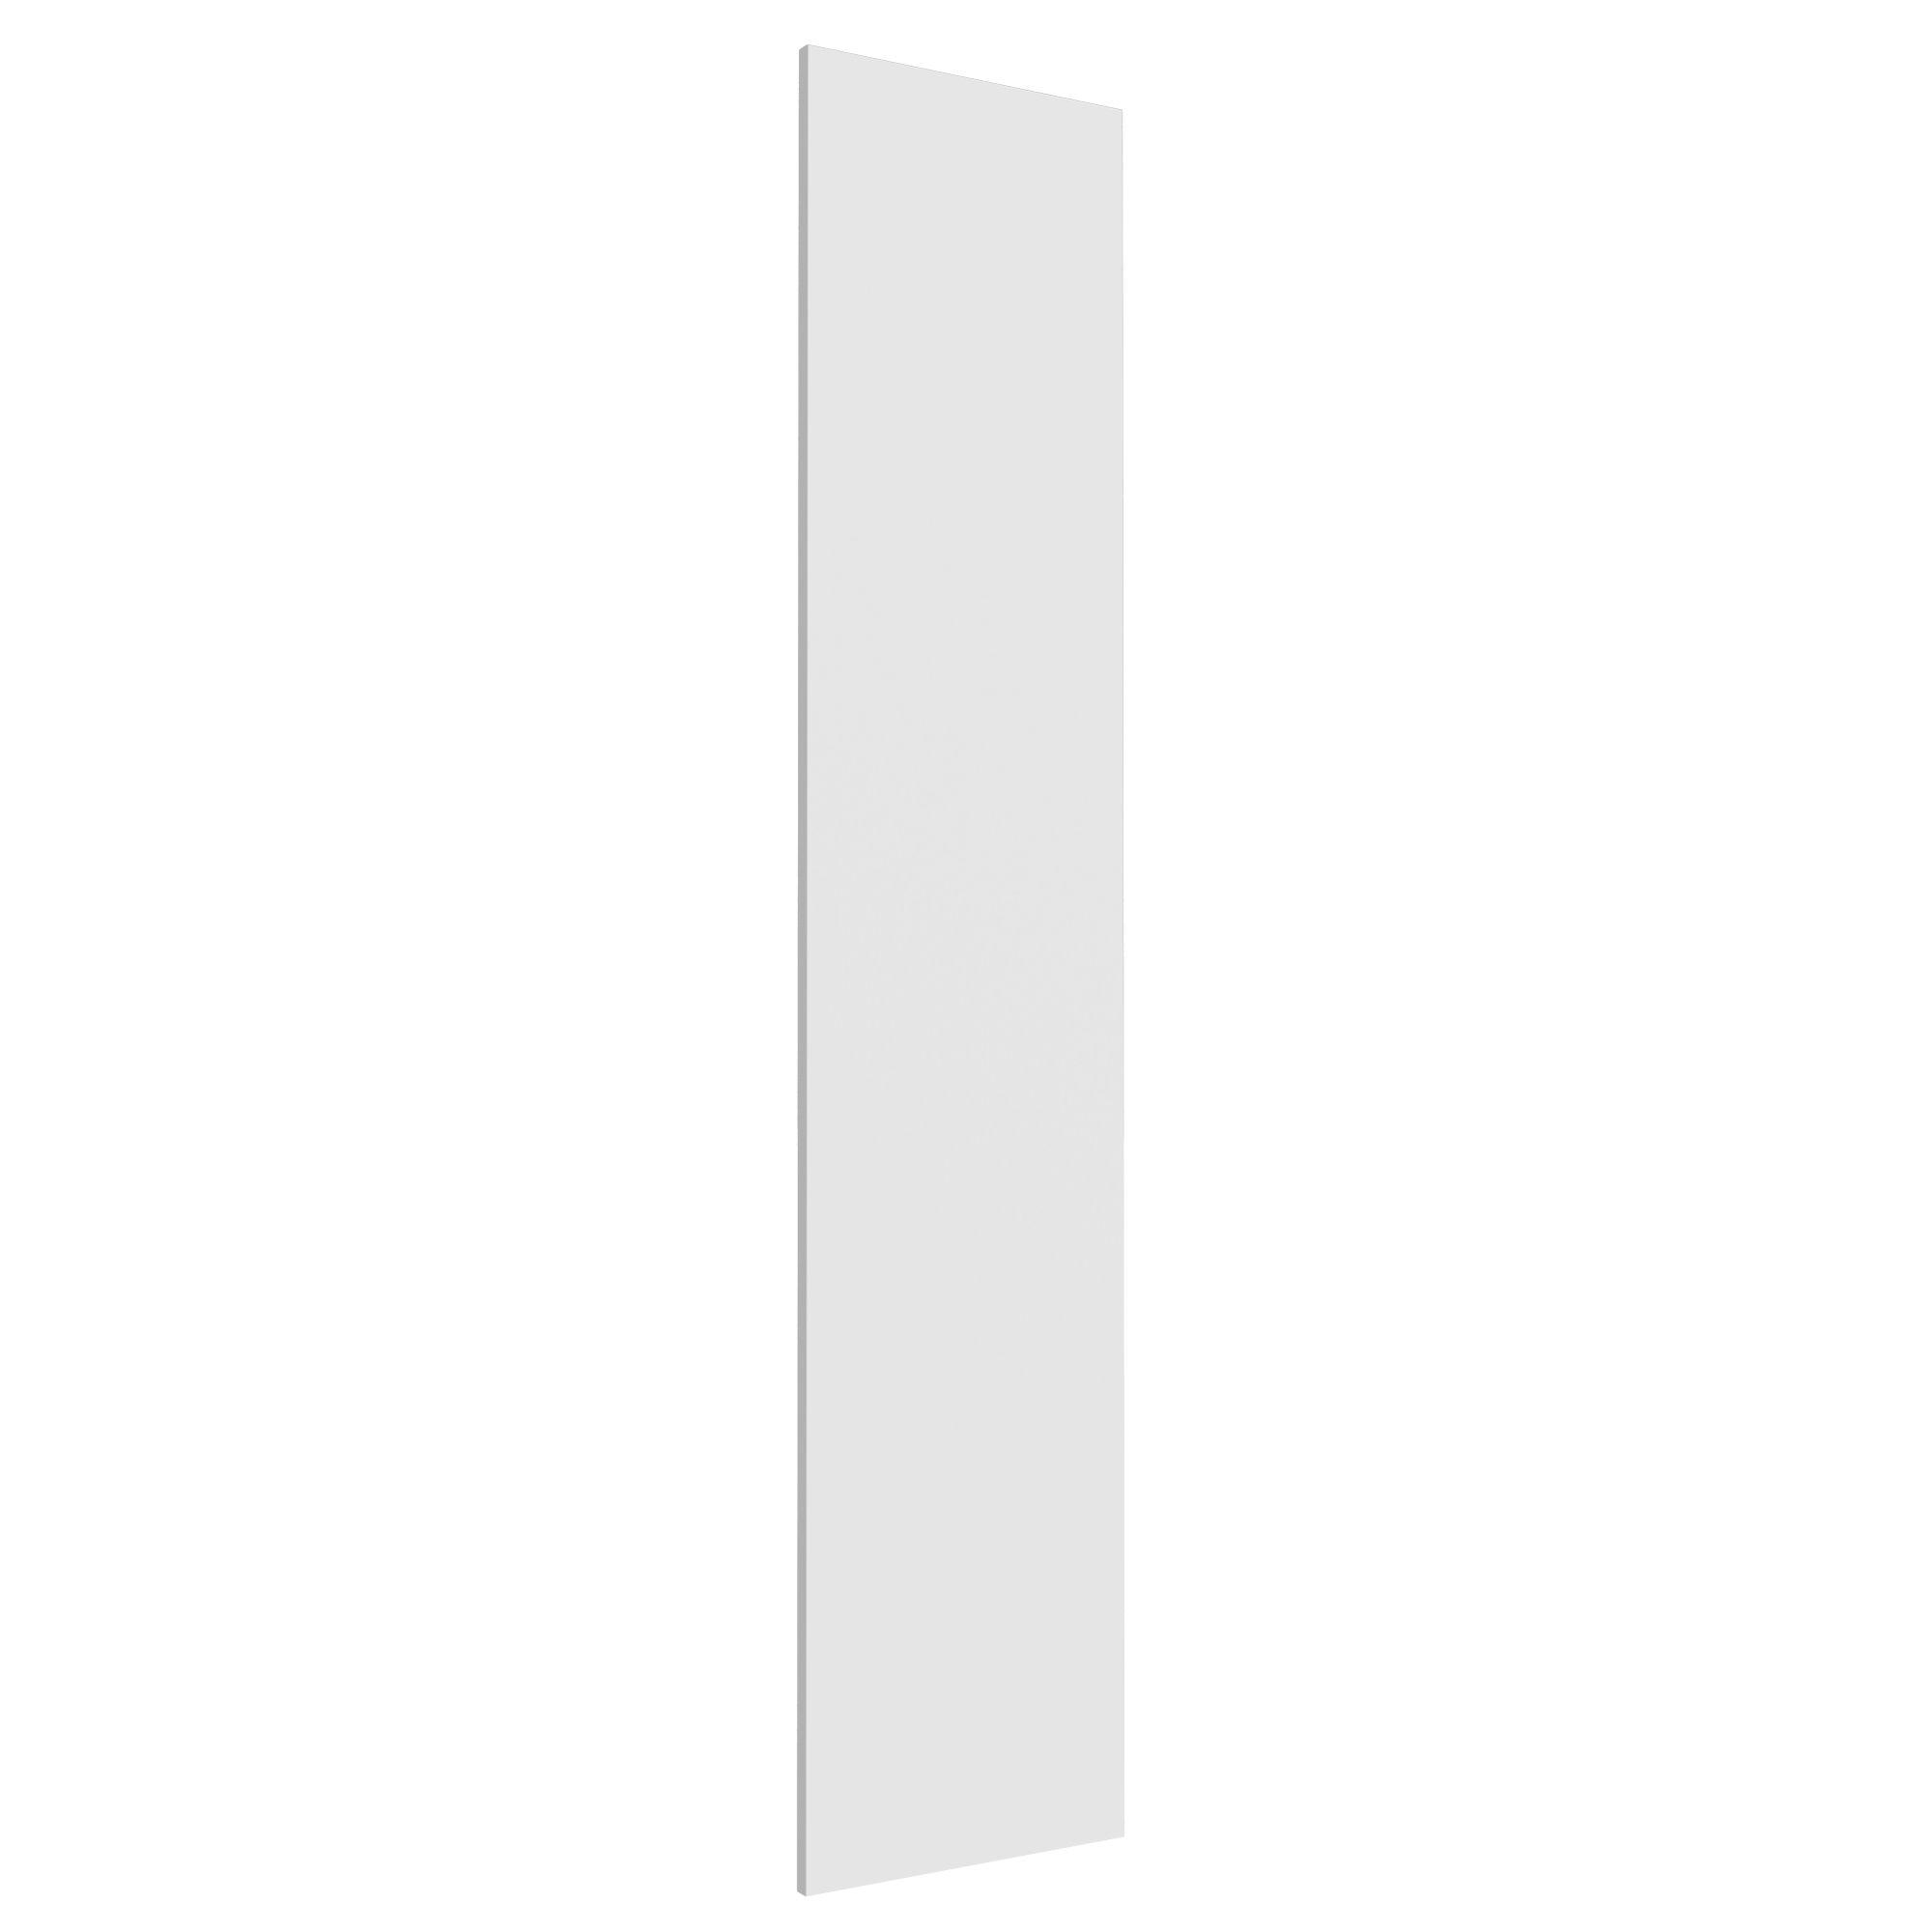 Darwin Modular White & Matt Wardrobe Door (h)1808mm (w)372mm (d)16mm